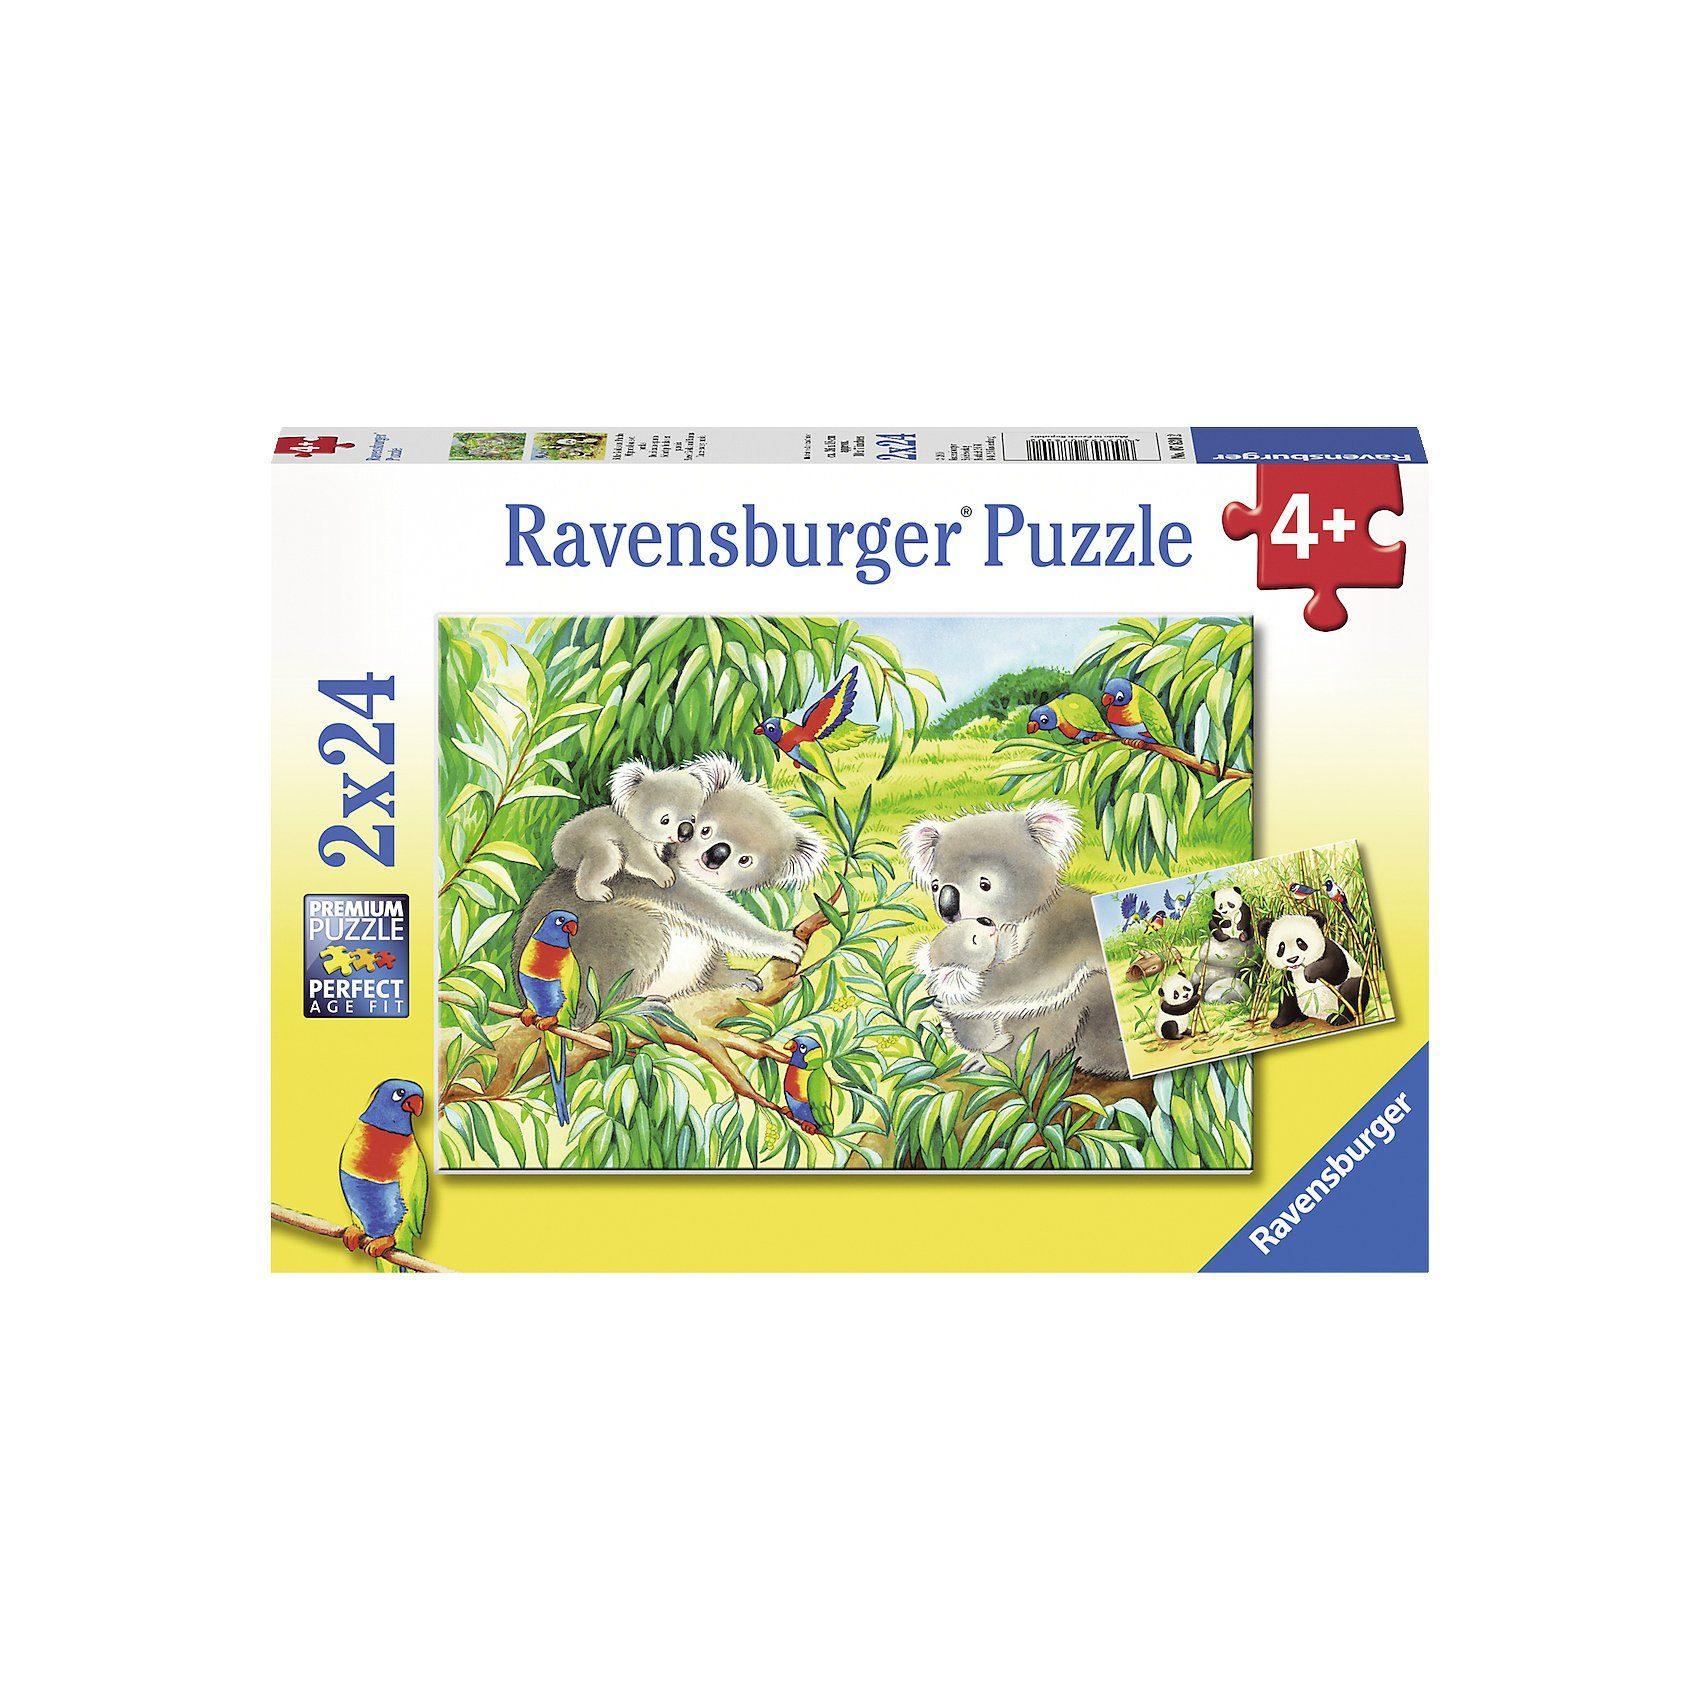 Ravensburger Puzzleset 2 x 24 Teile Süße Koalas und Pandas